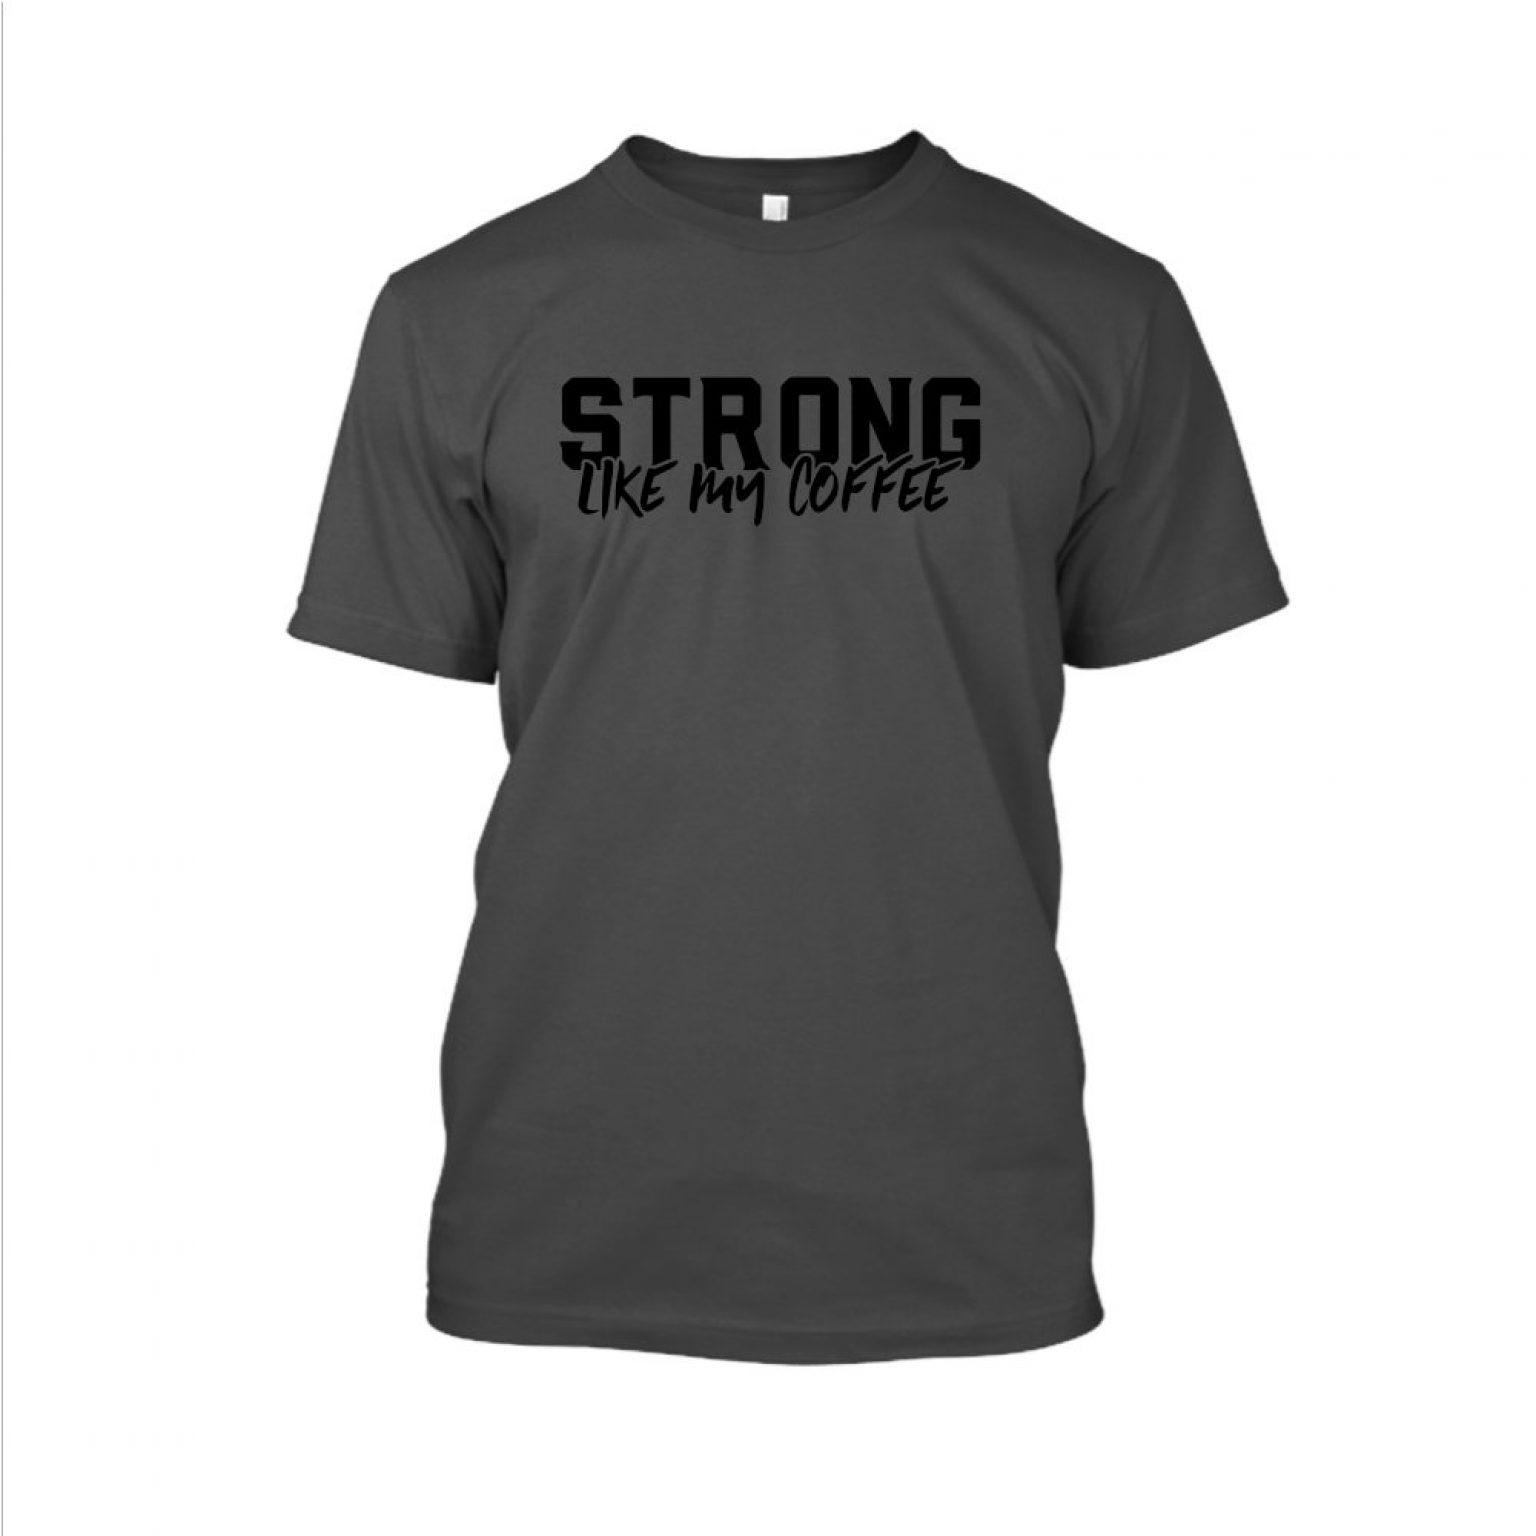 Strong likemycoffe Shirt herren charcoal